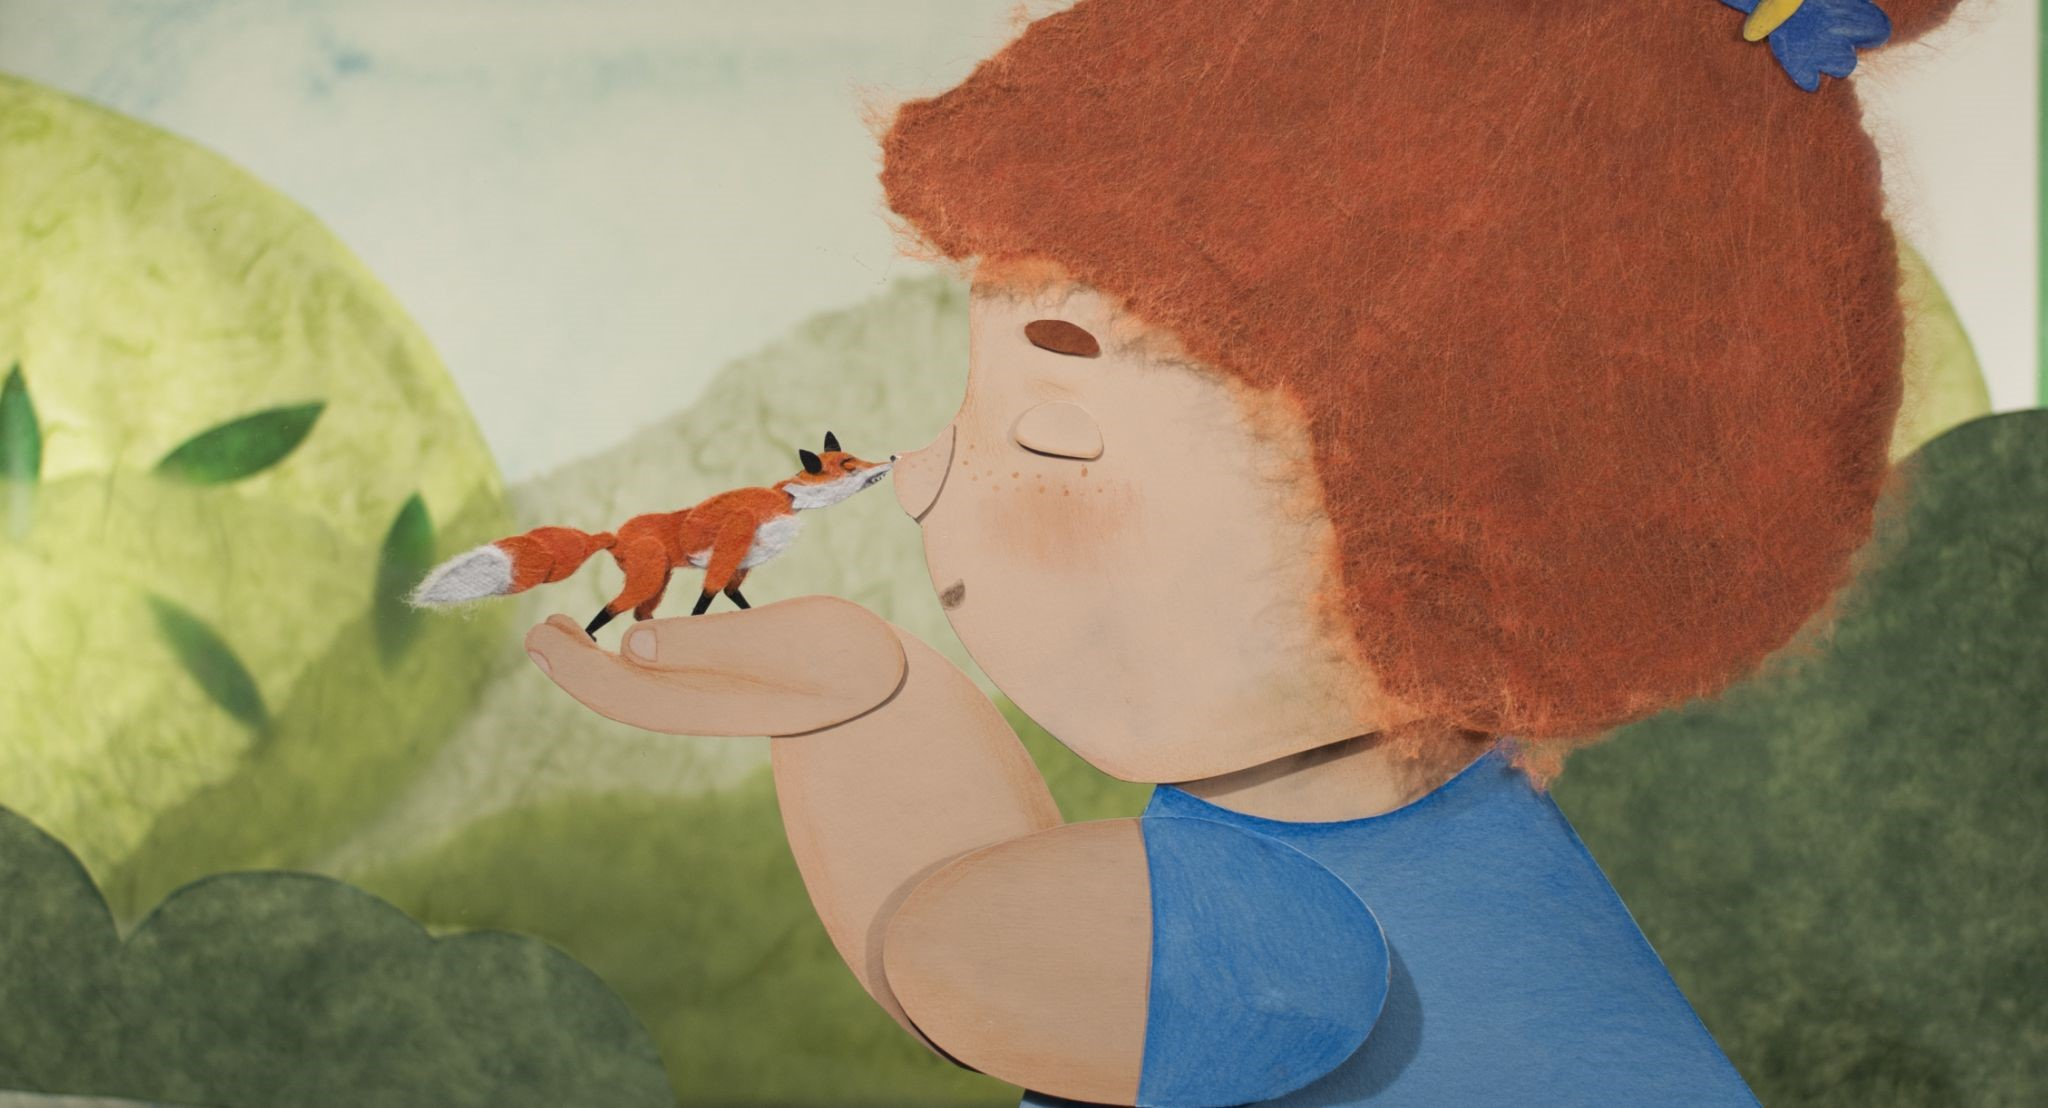 animatou spoutnik 2016 LE RENARD MINUSCULE | Sylwia Szkiladz, Aline Quertain